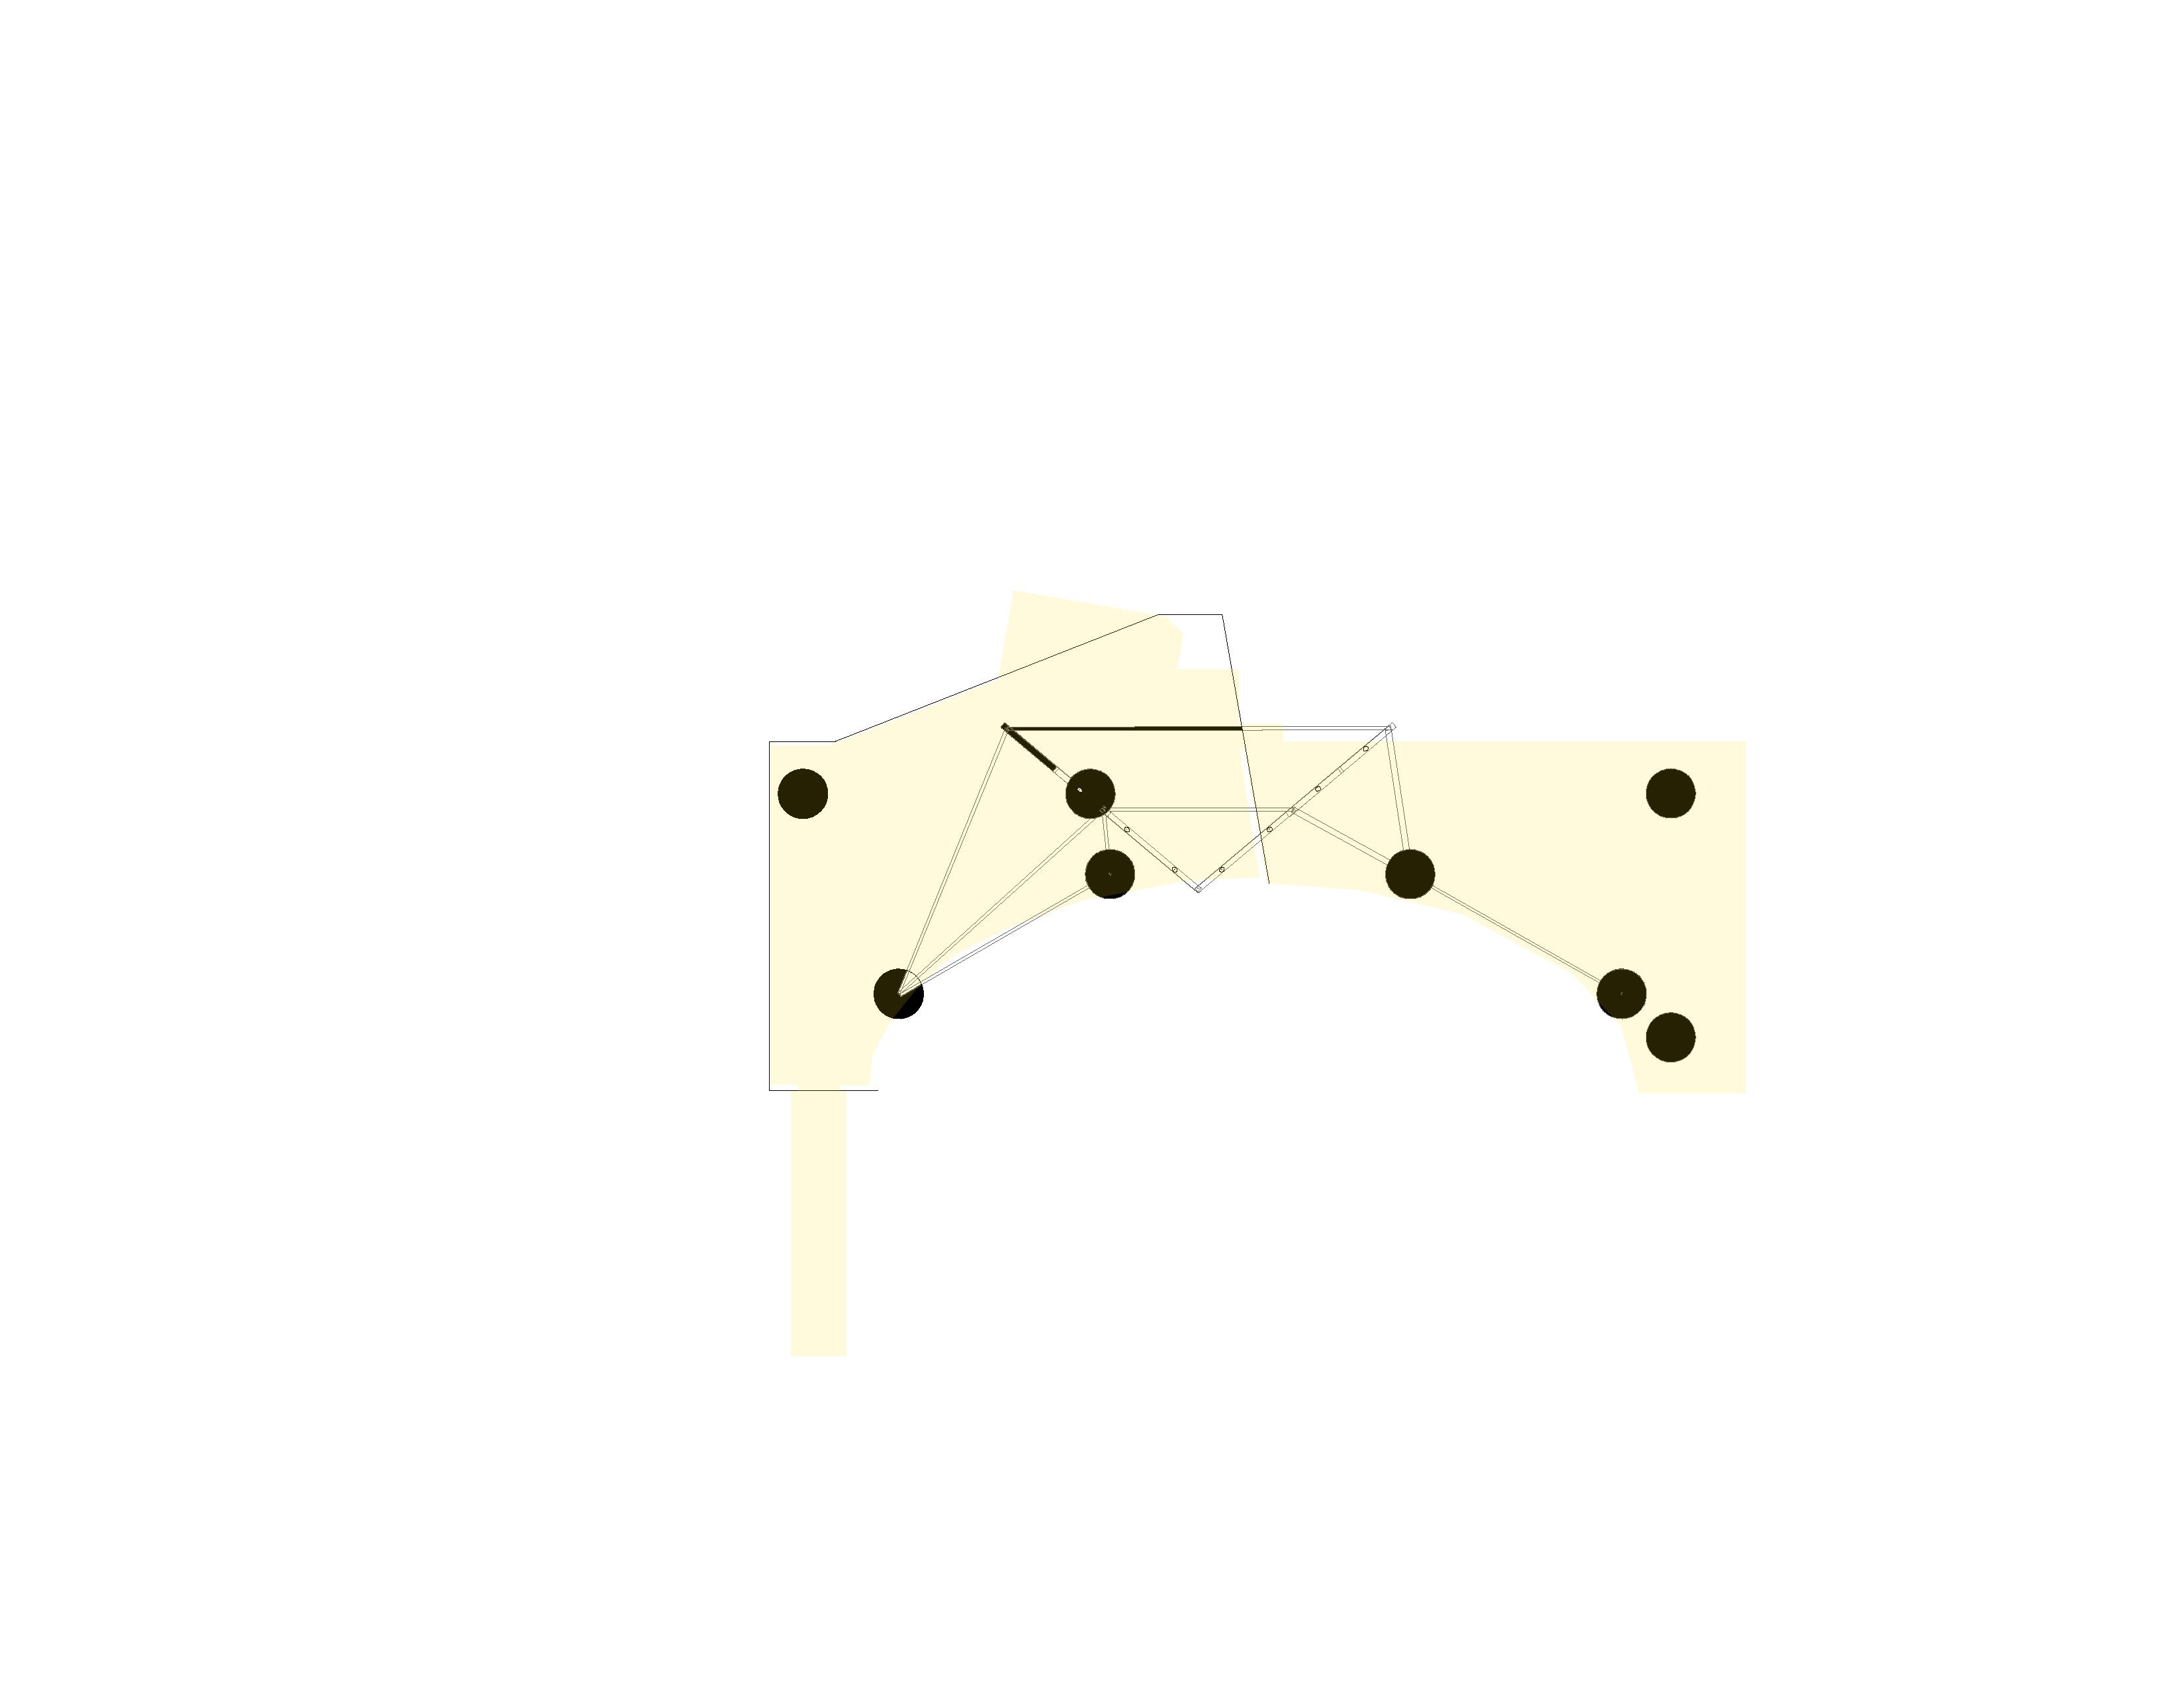 Third Floor, Structural Diagram